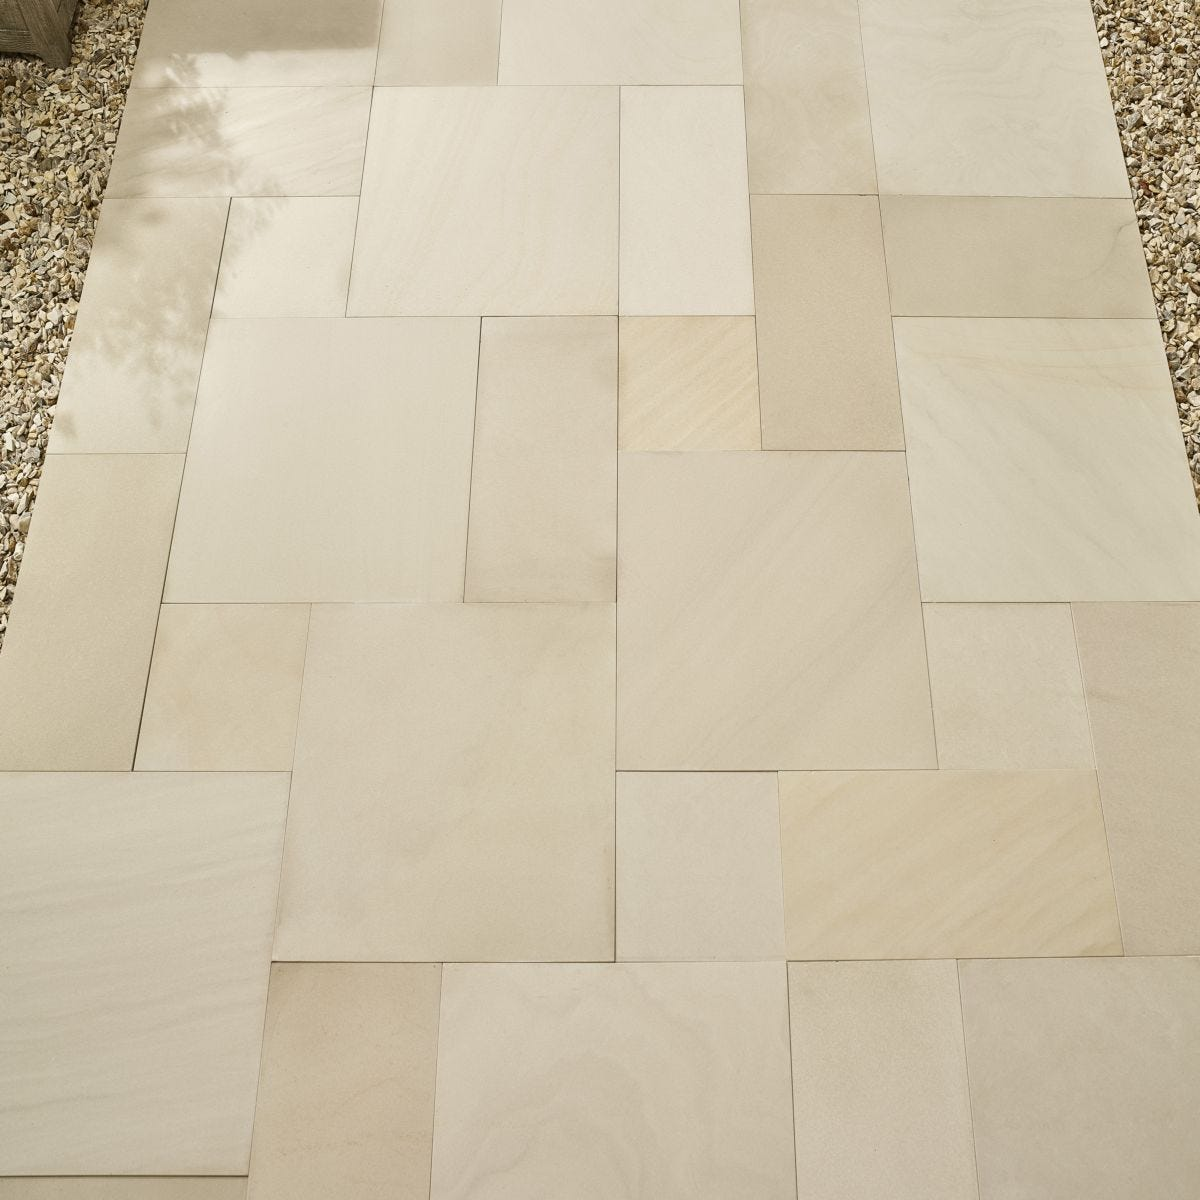 Kelkay Smooth Natural Sandstone 11.52m - Ivory White